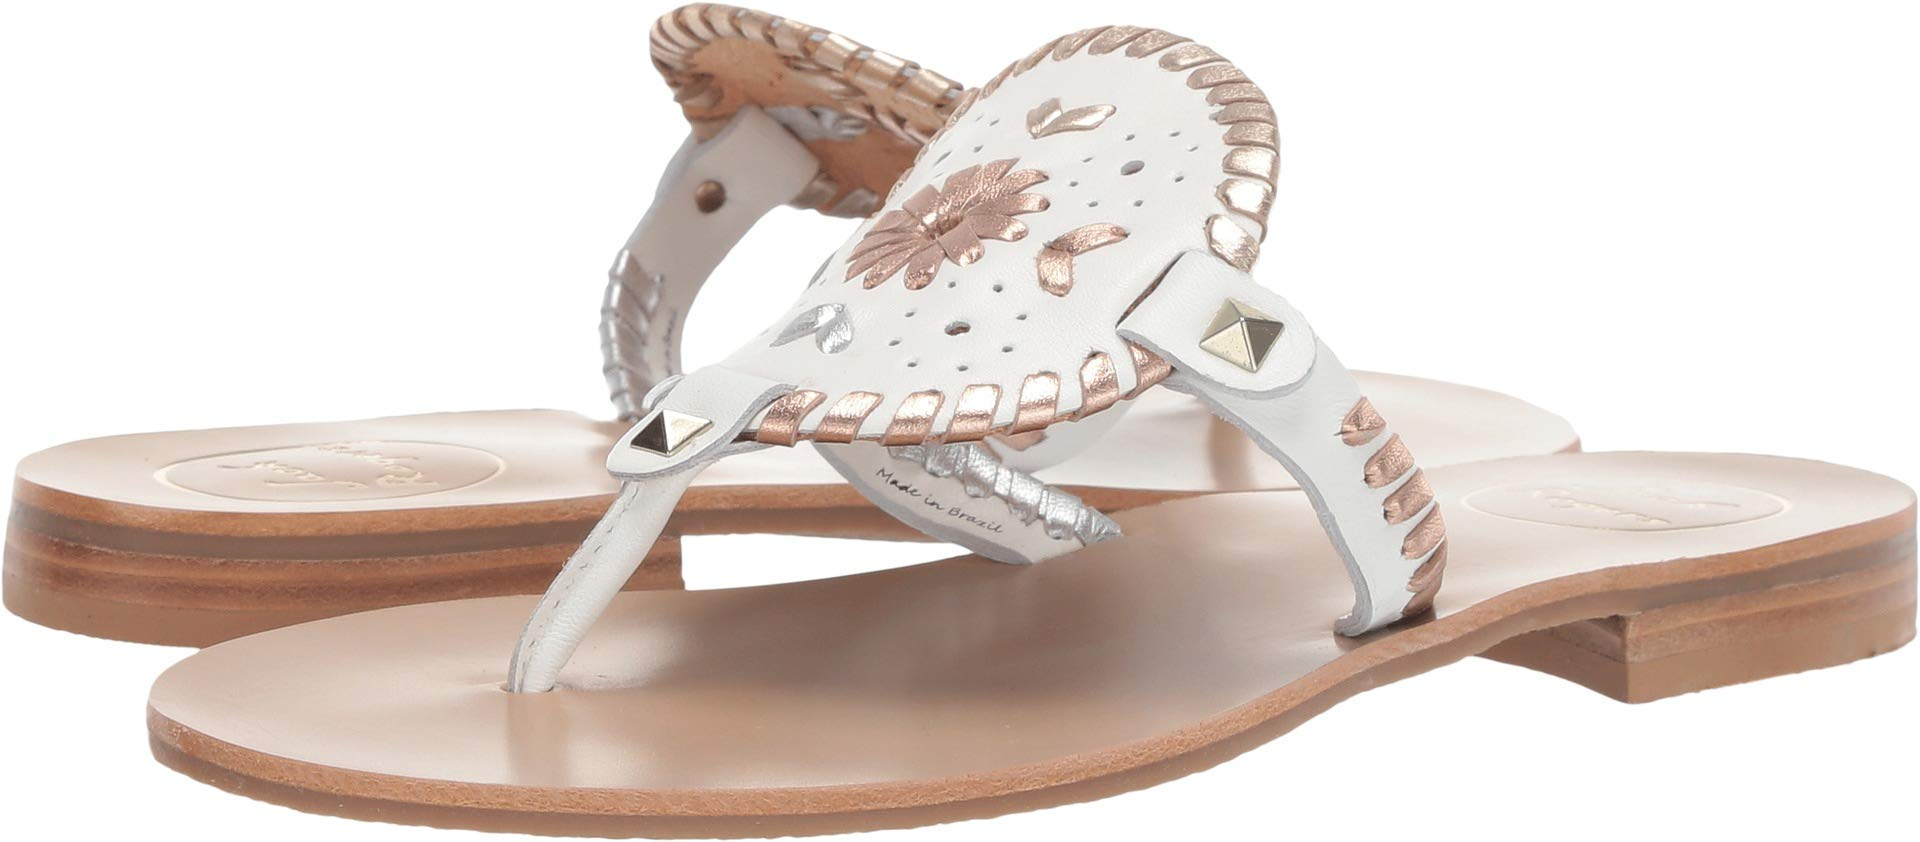 Jack Rogers Women's Georgica Sandal White Metallic 7 M US